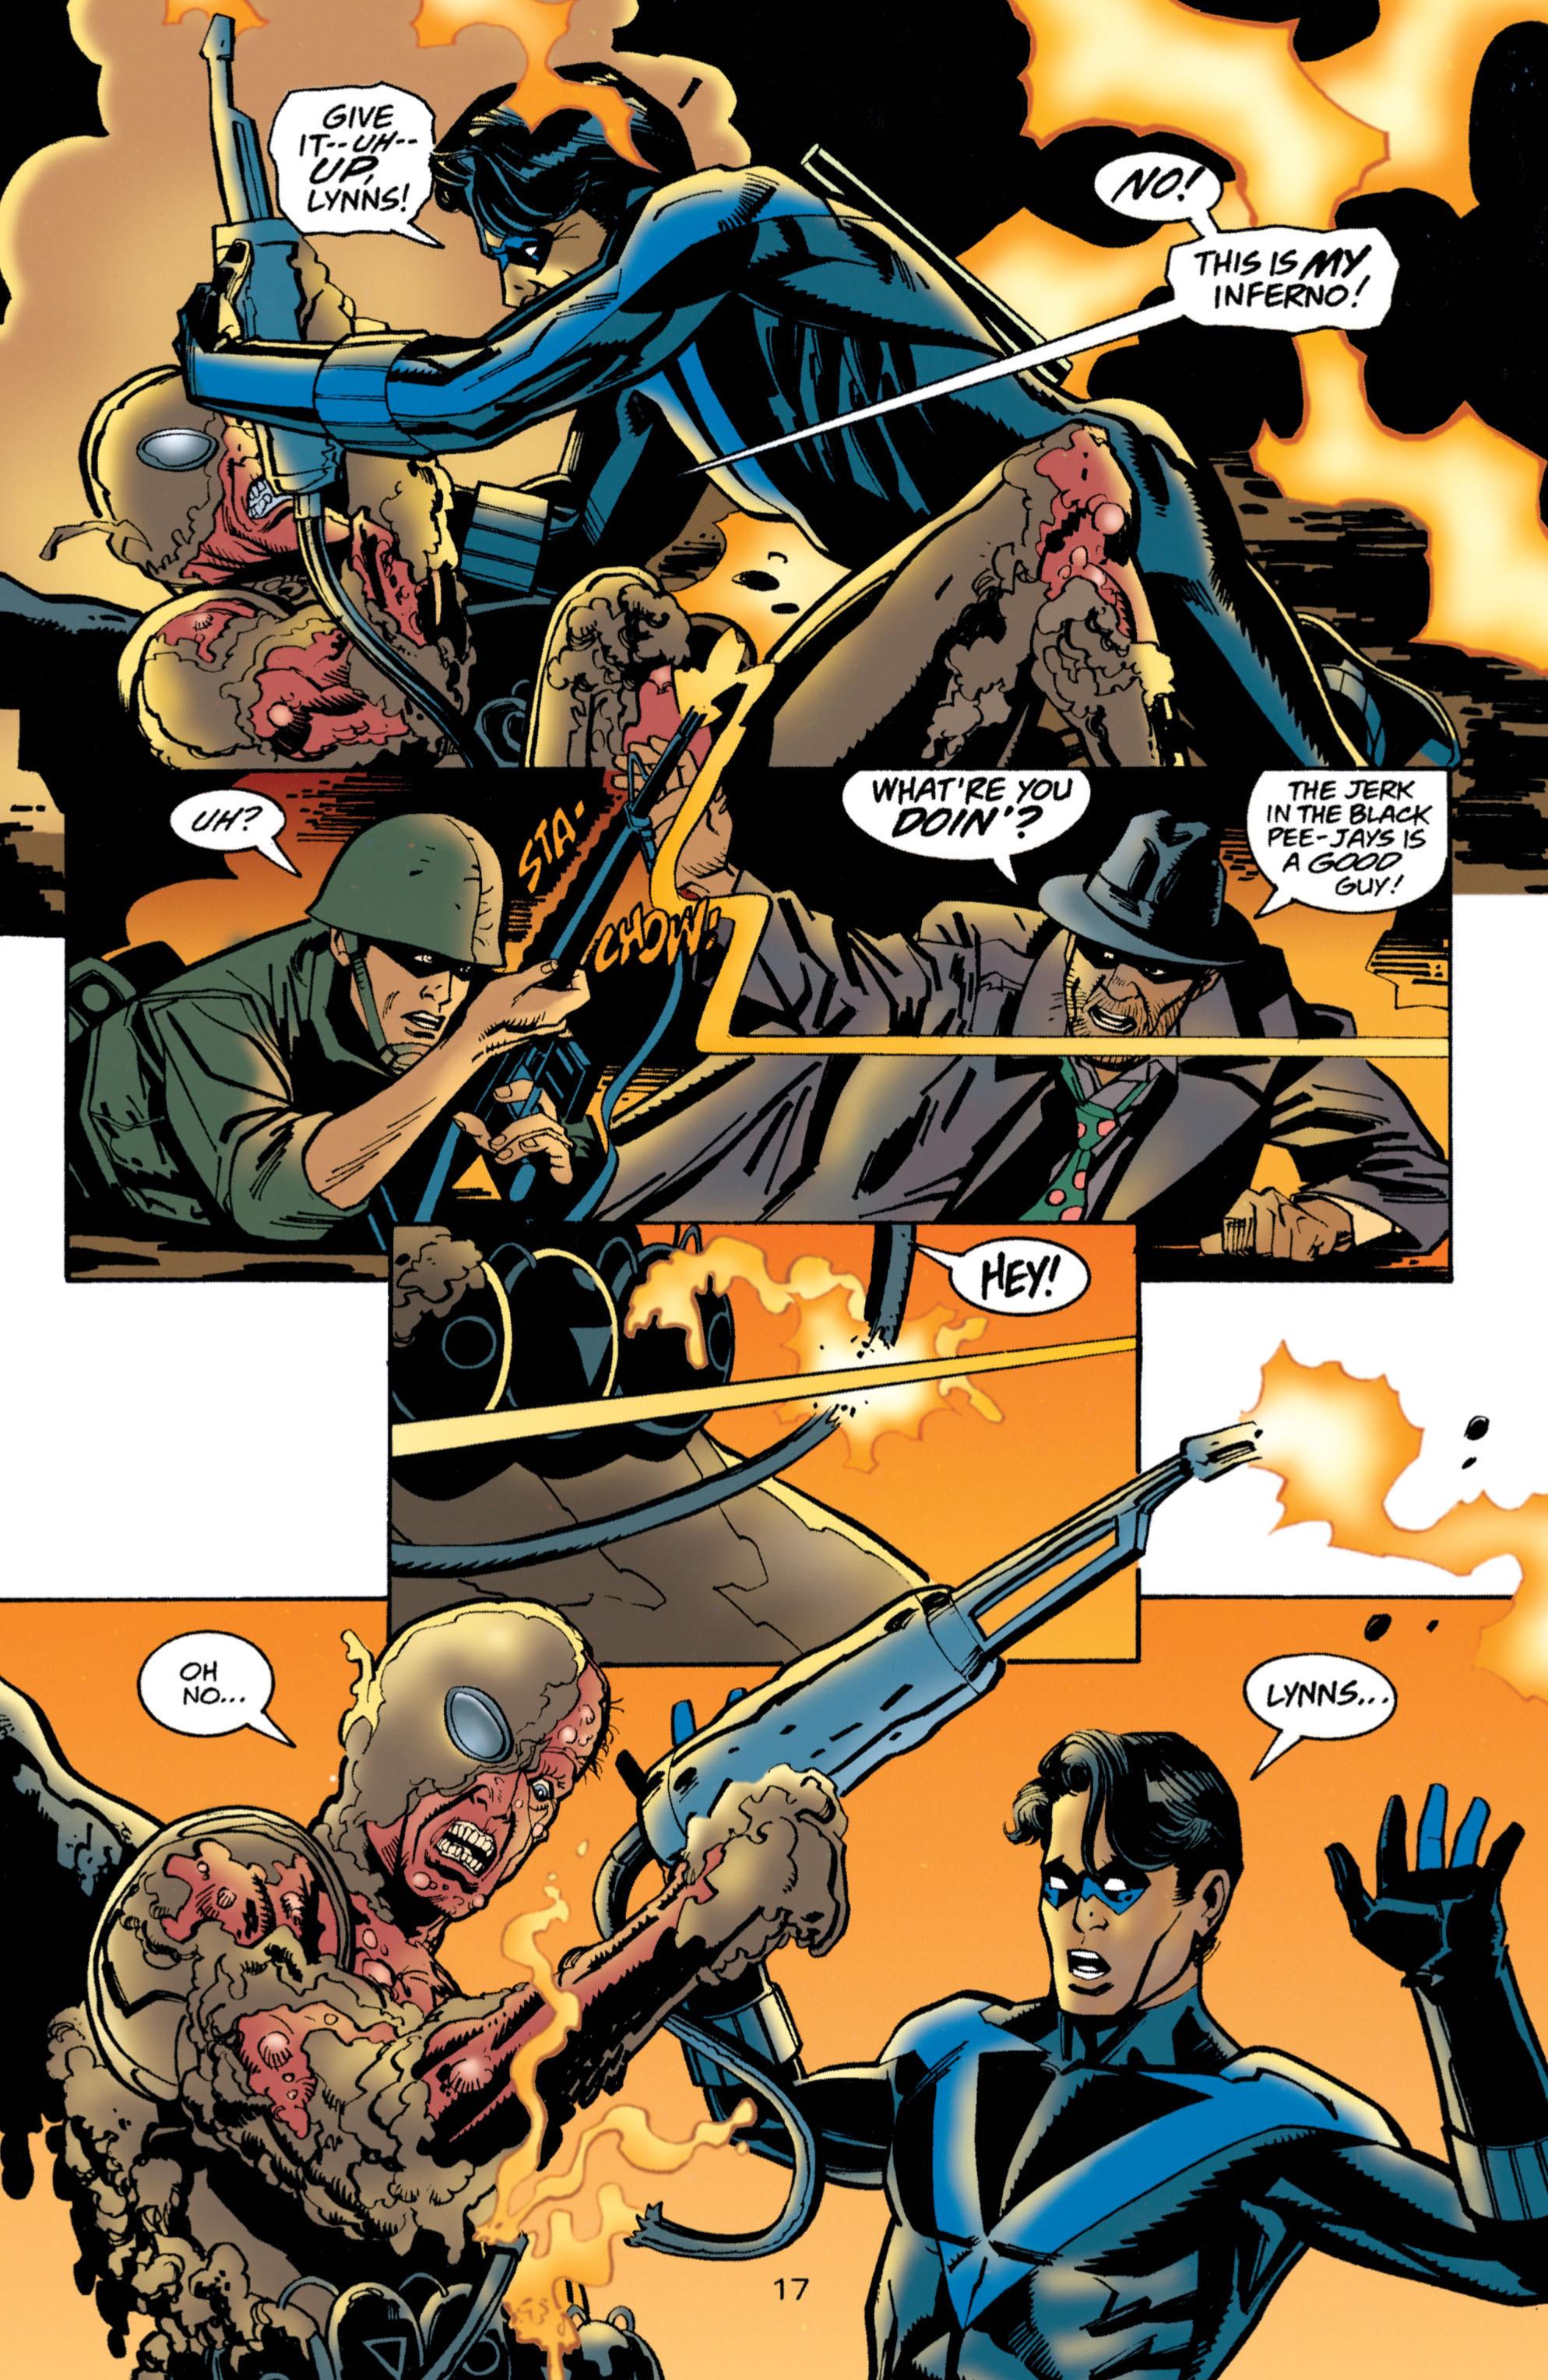 Detective Comics (1937) 727 Page 17